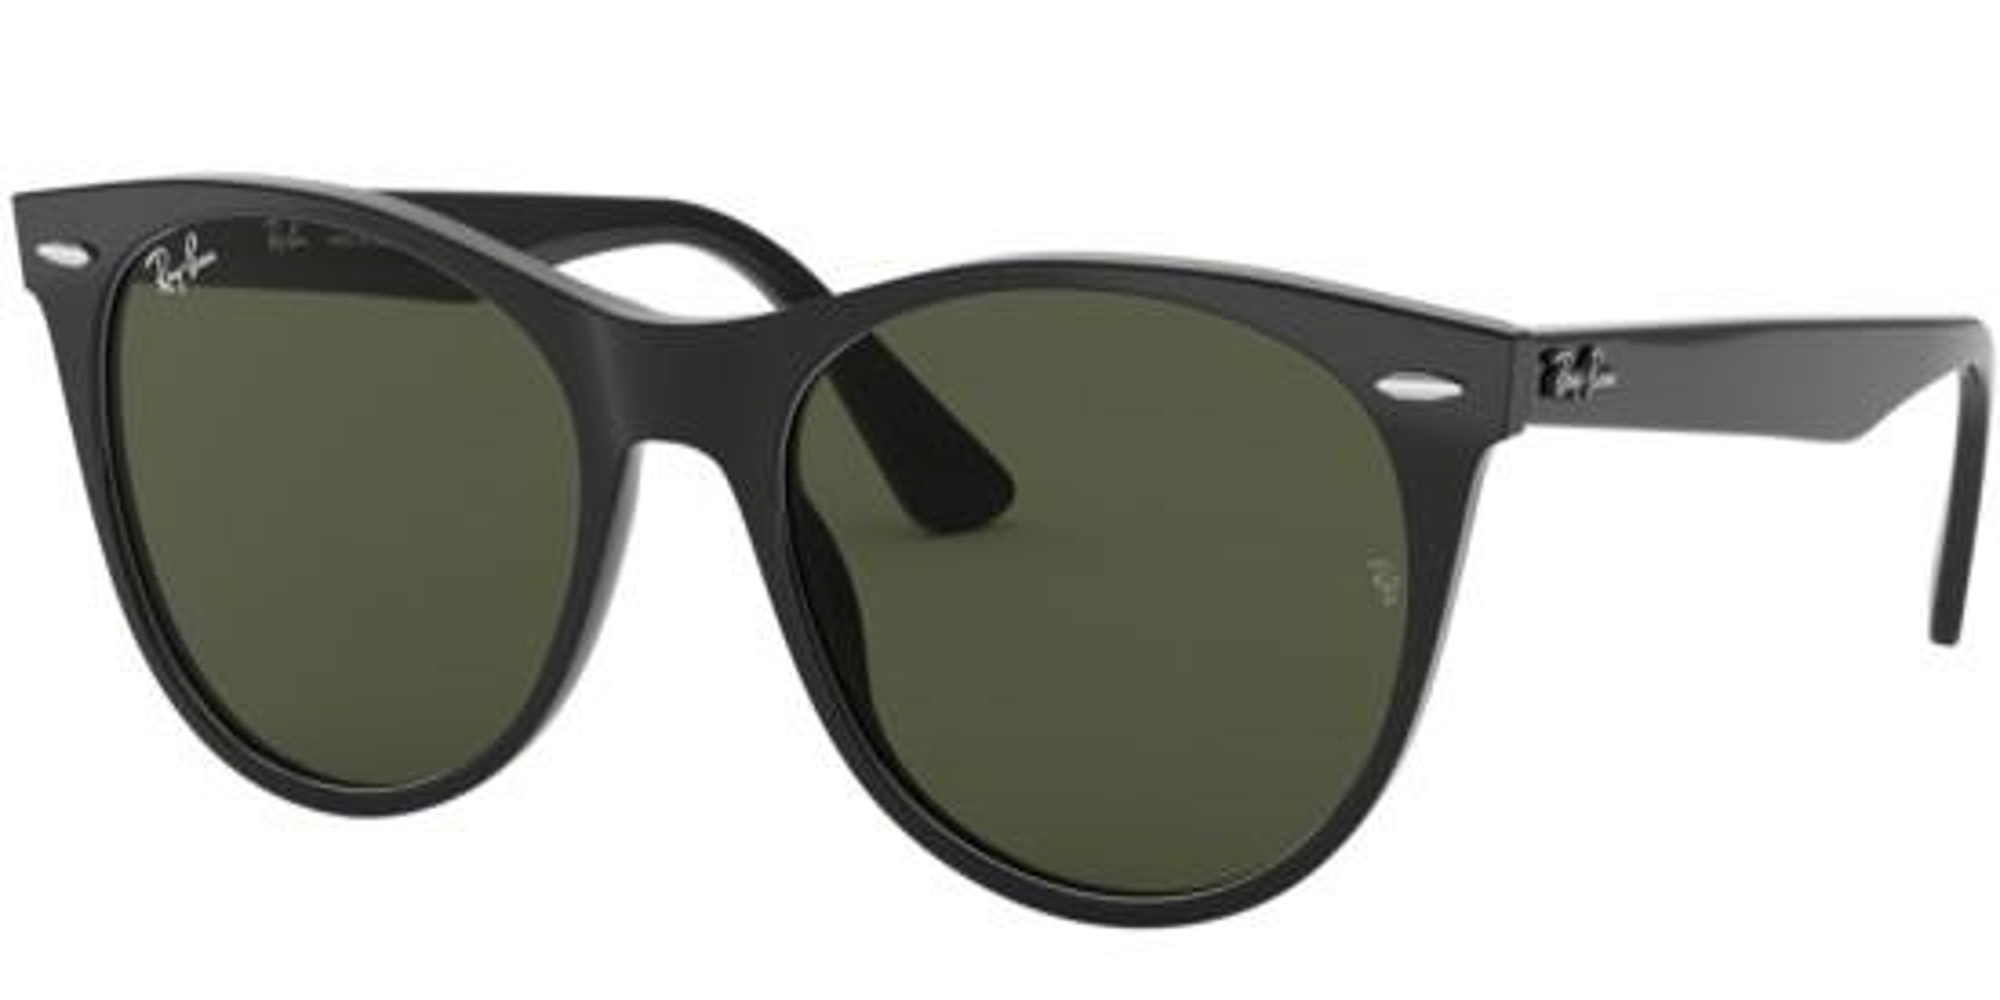 Ray-Ban sunglasses WAYFARER II RB 2185